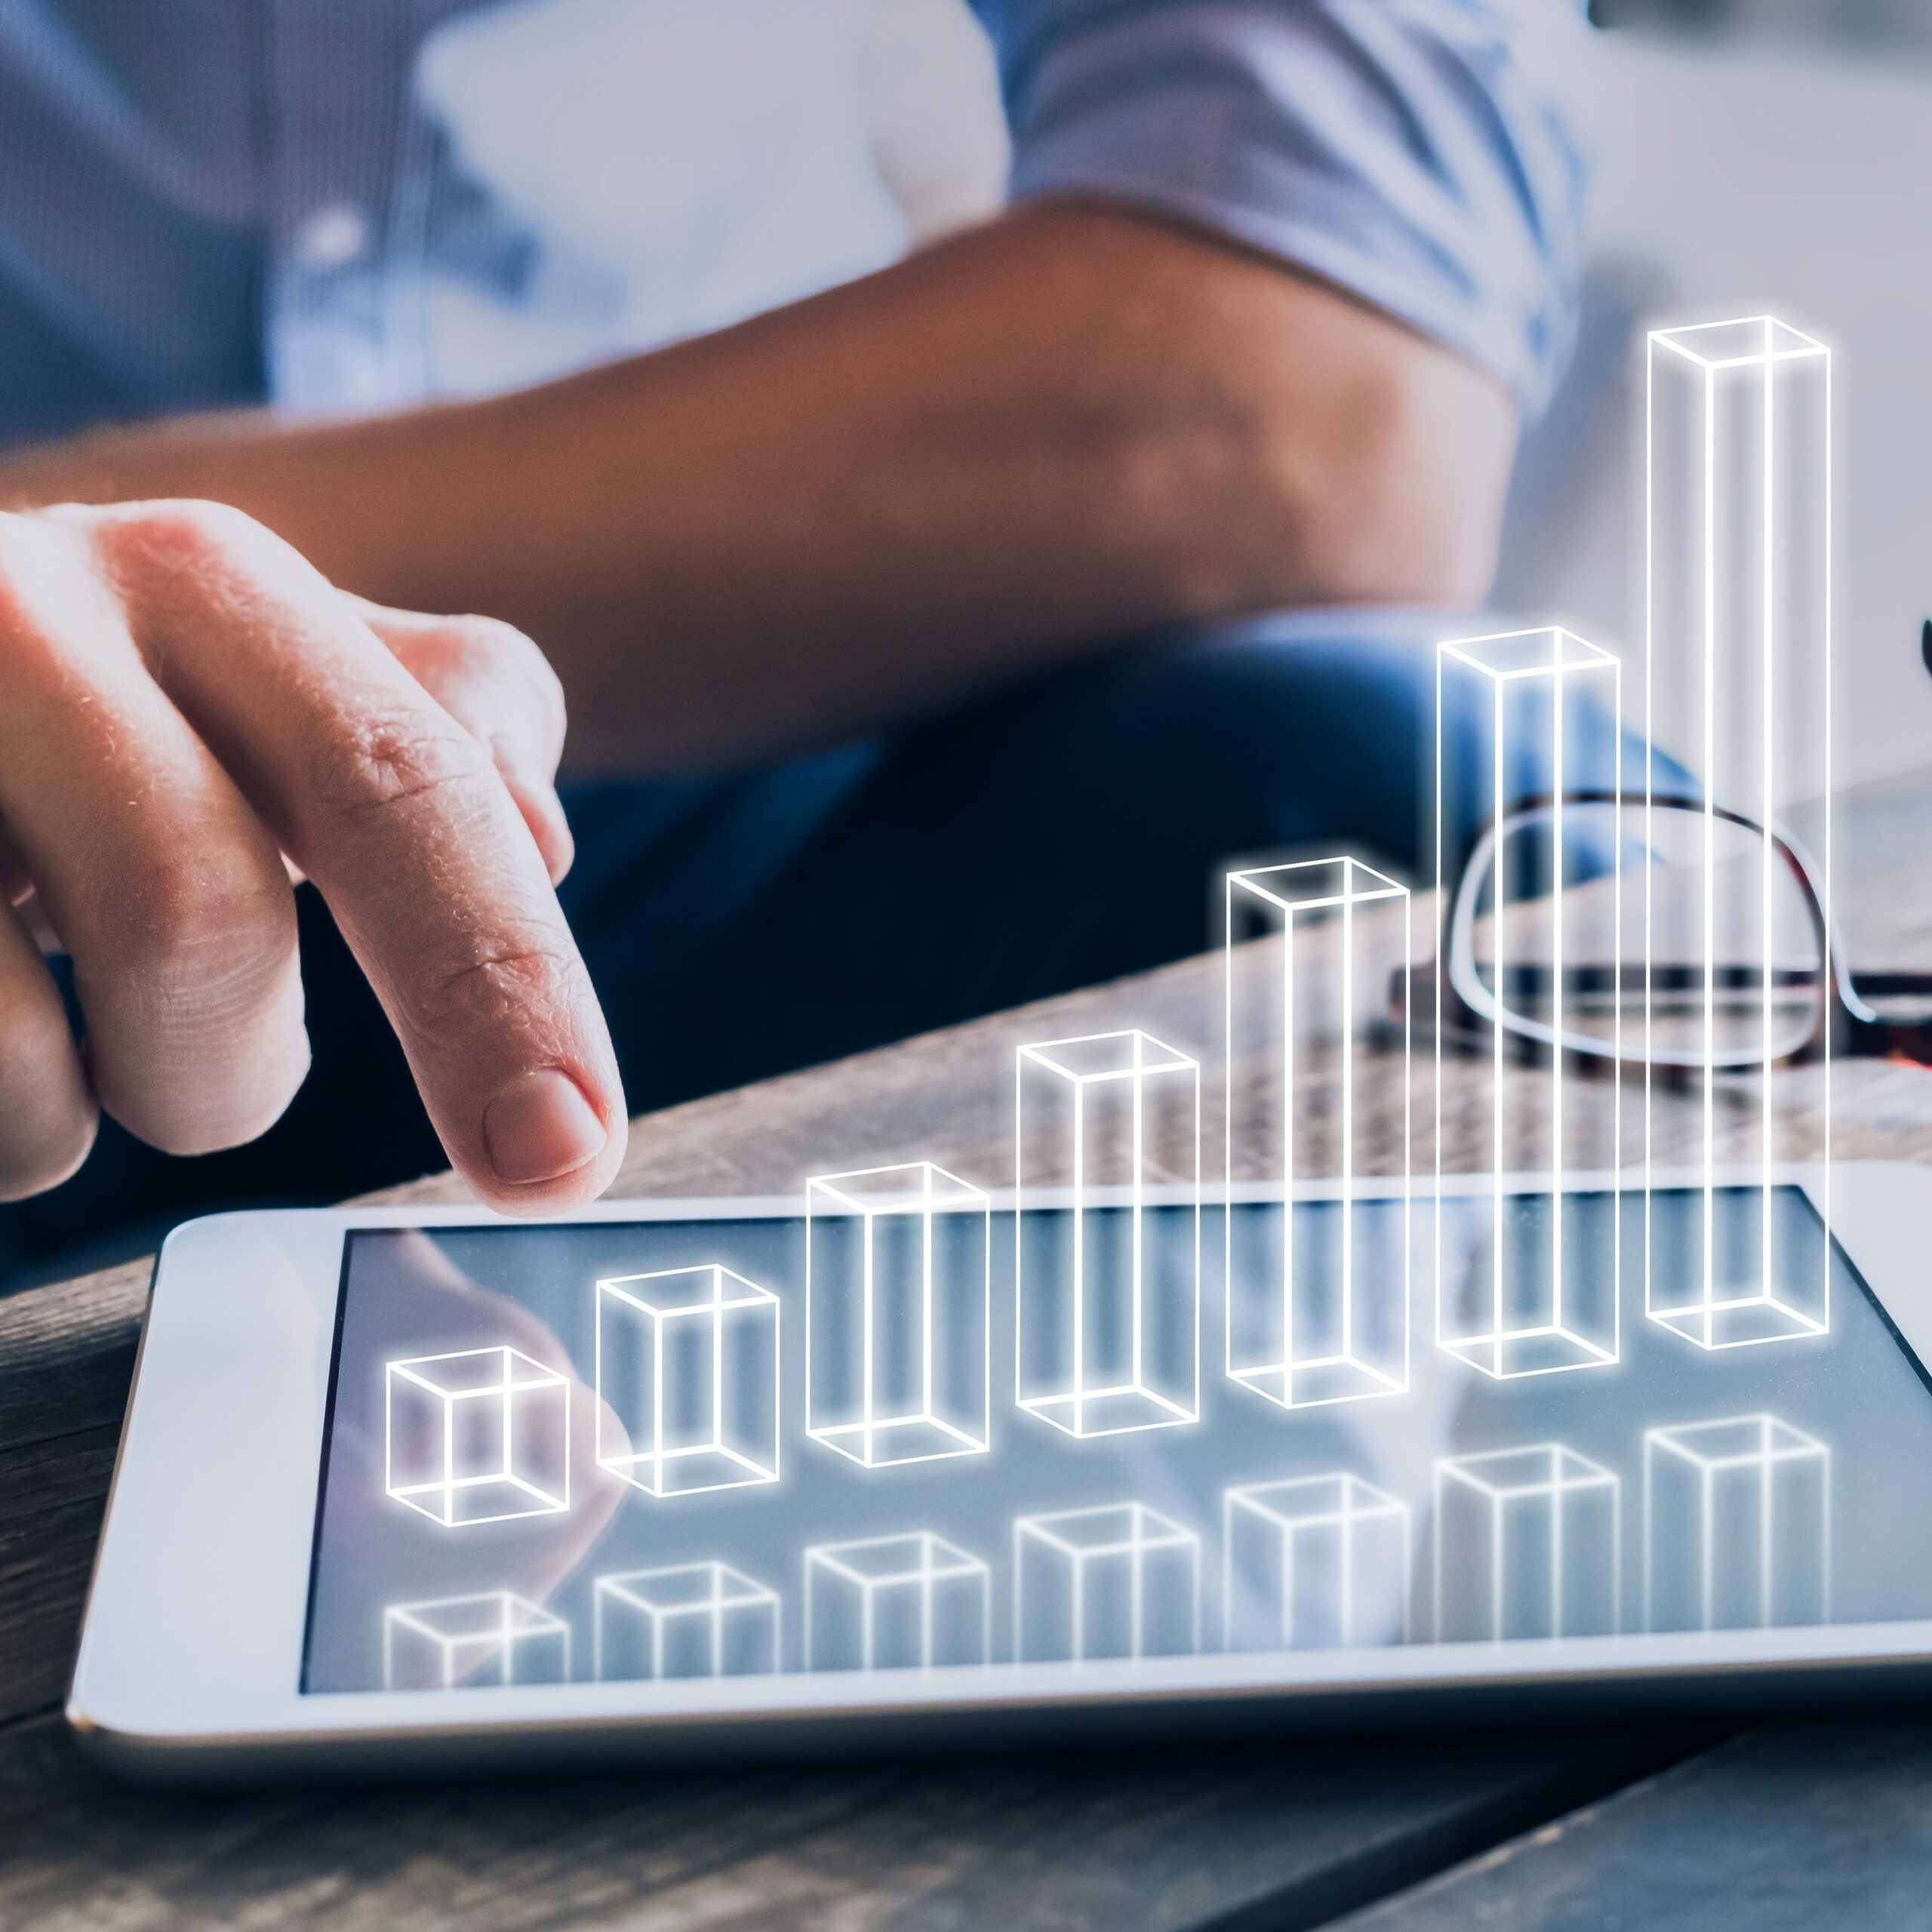 Businessman Analyzing Growing 3D AR Chart Above Tablet Computer Screen